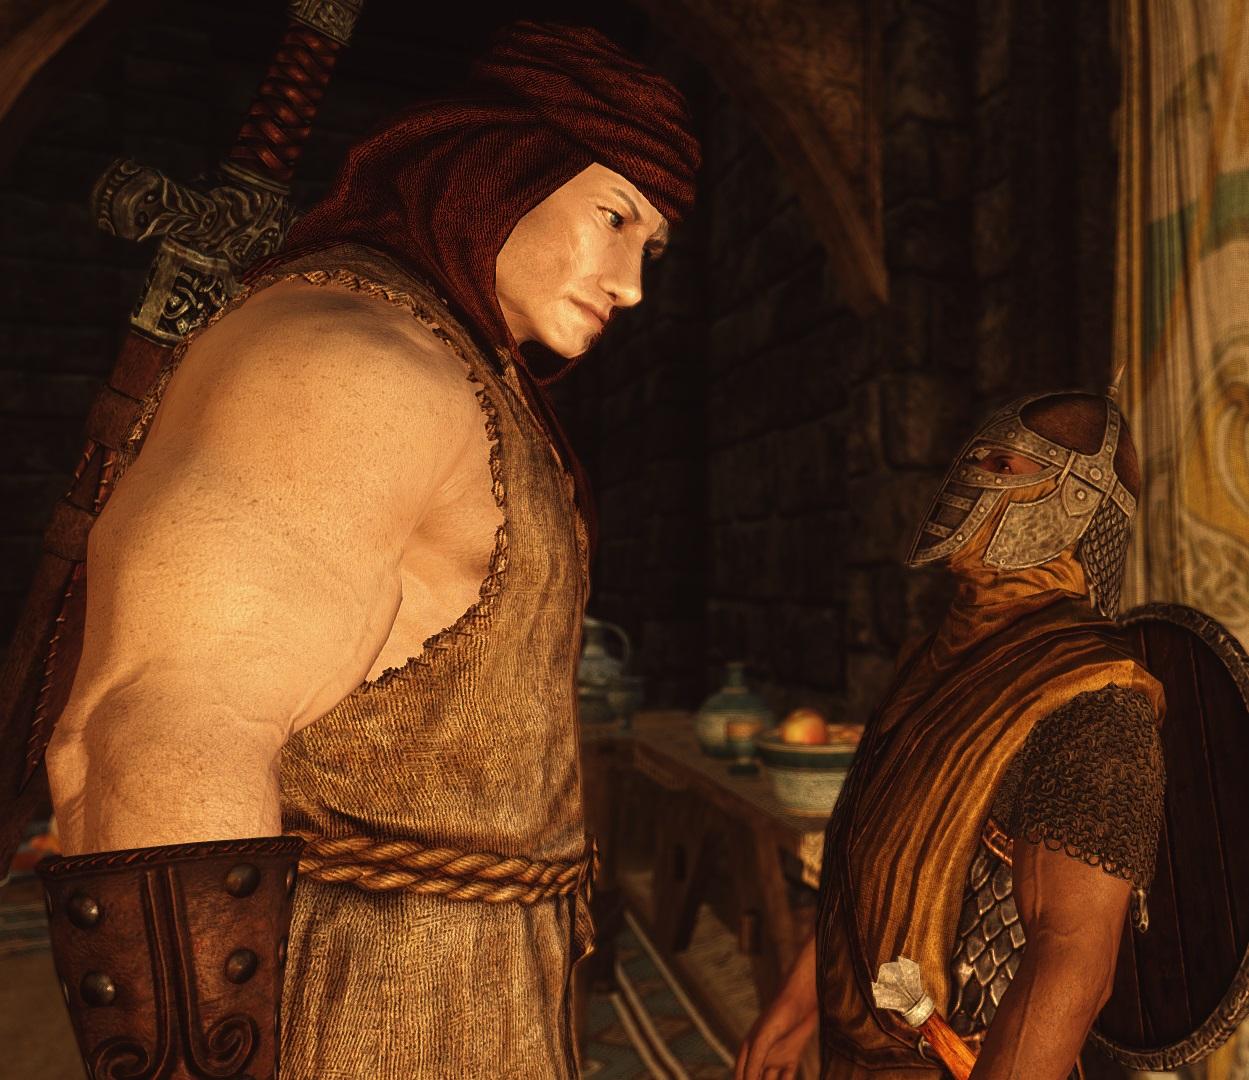 Loa - Elder Scrolls 5: Skyrim, the